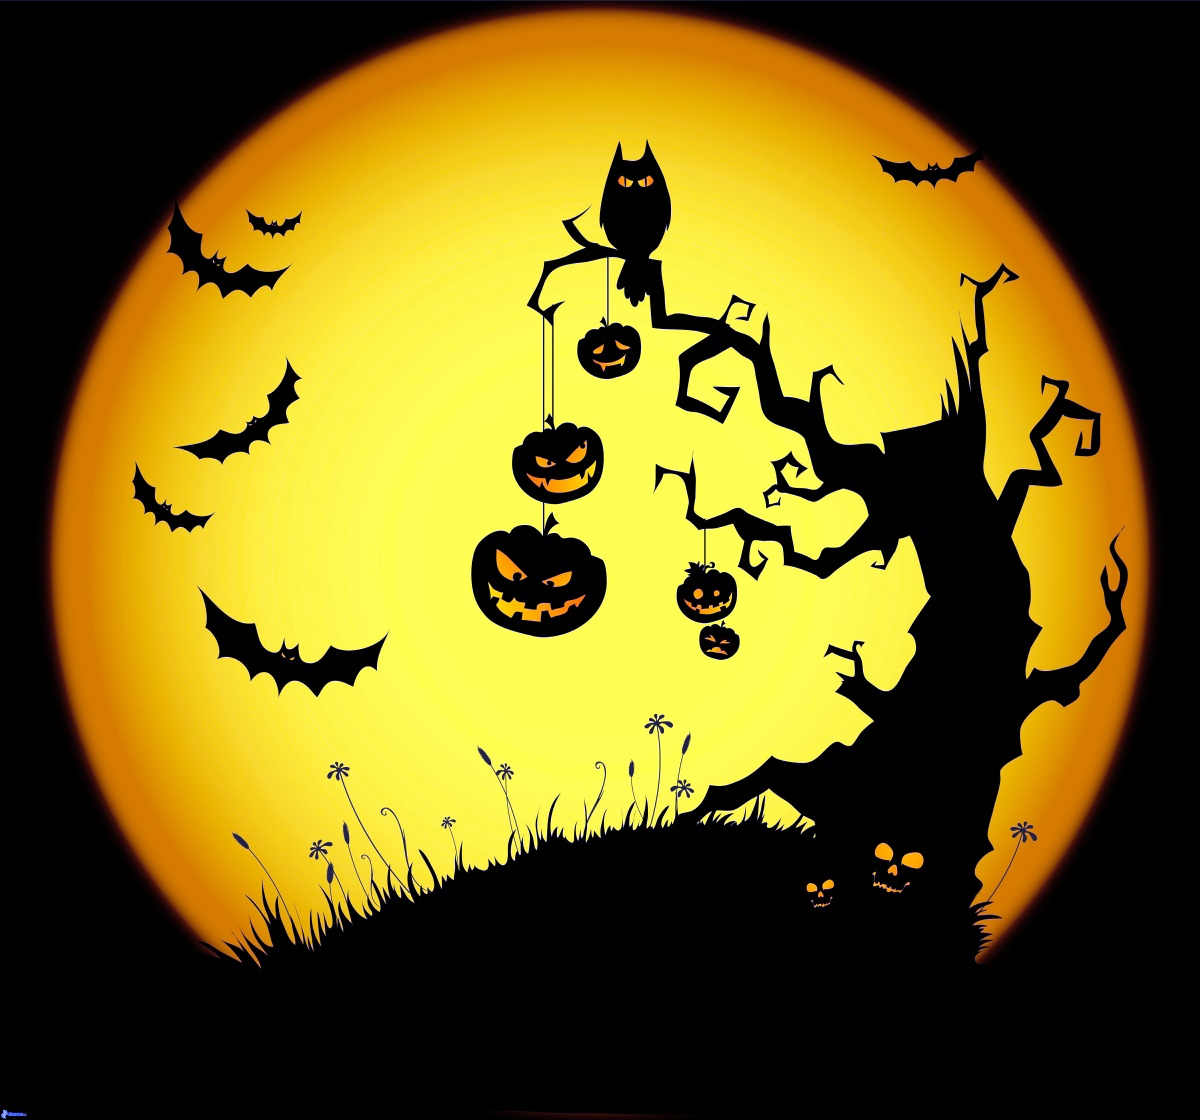 00 happy halloween 02. 31.10.14